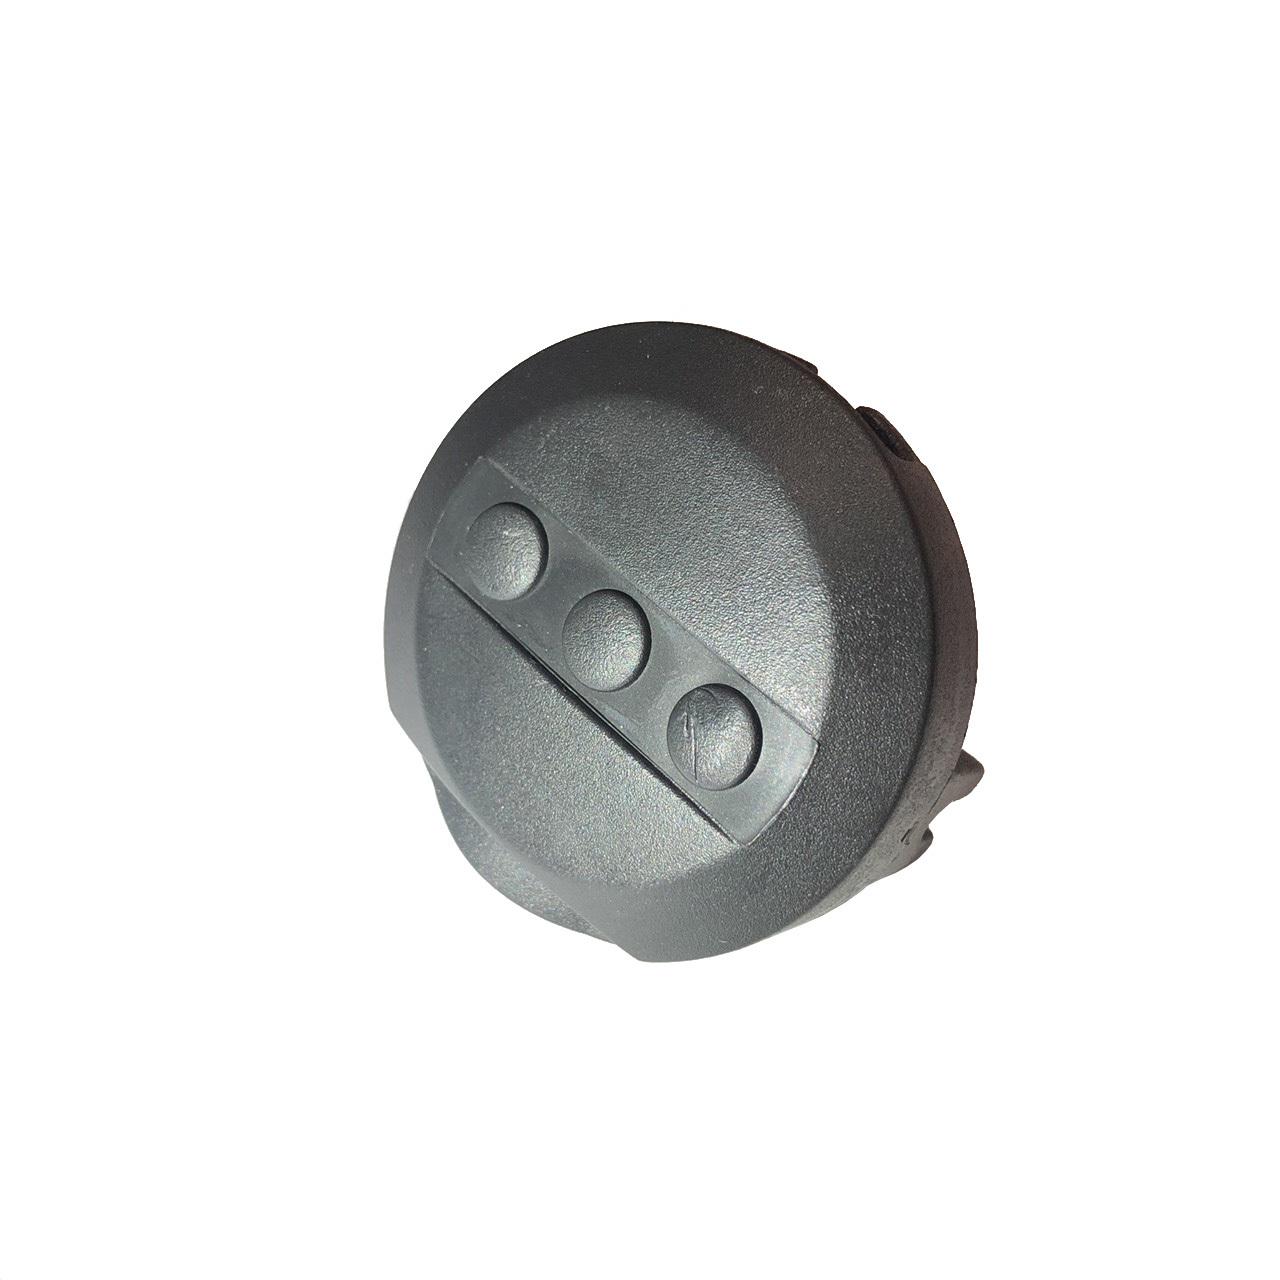 Втулки Втулка для металлического колеса без подшипника втулка_без_подш_2.jpg